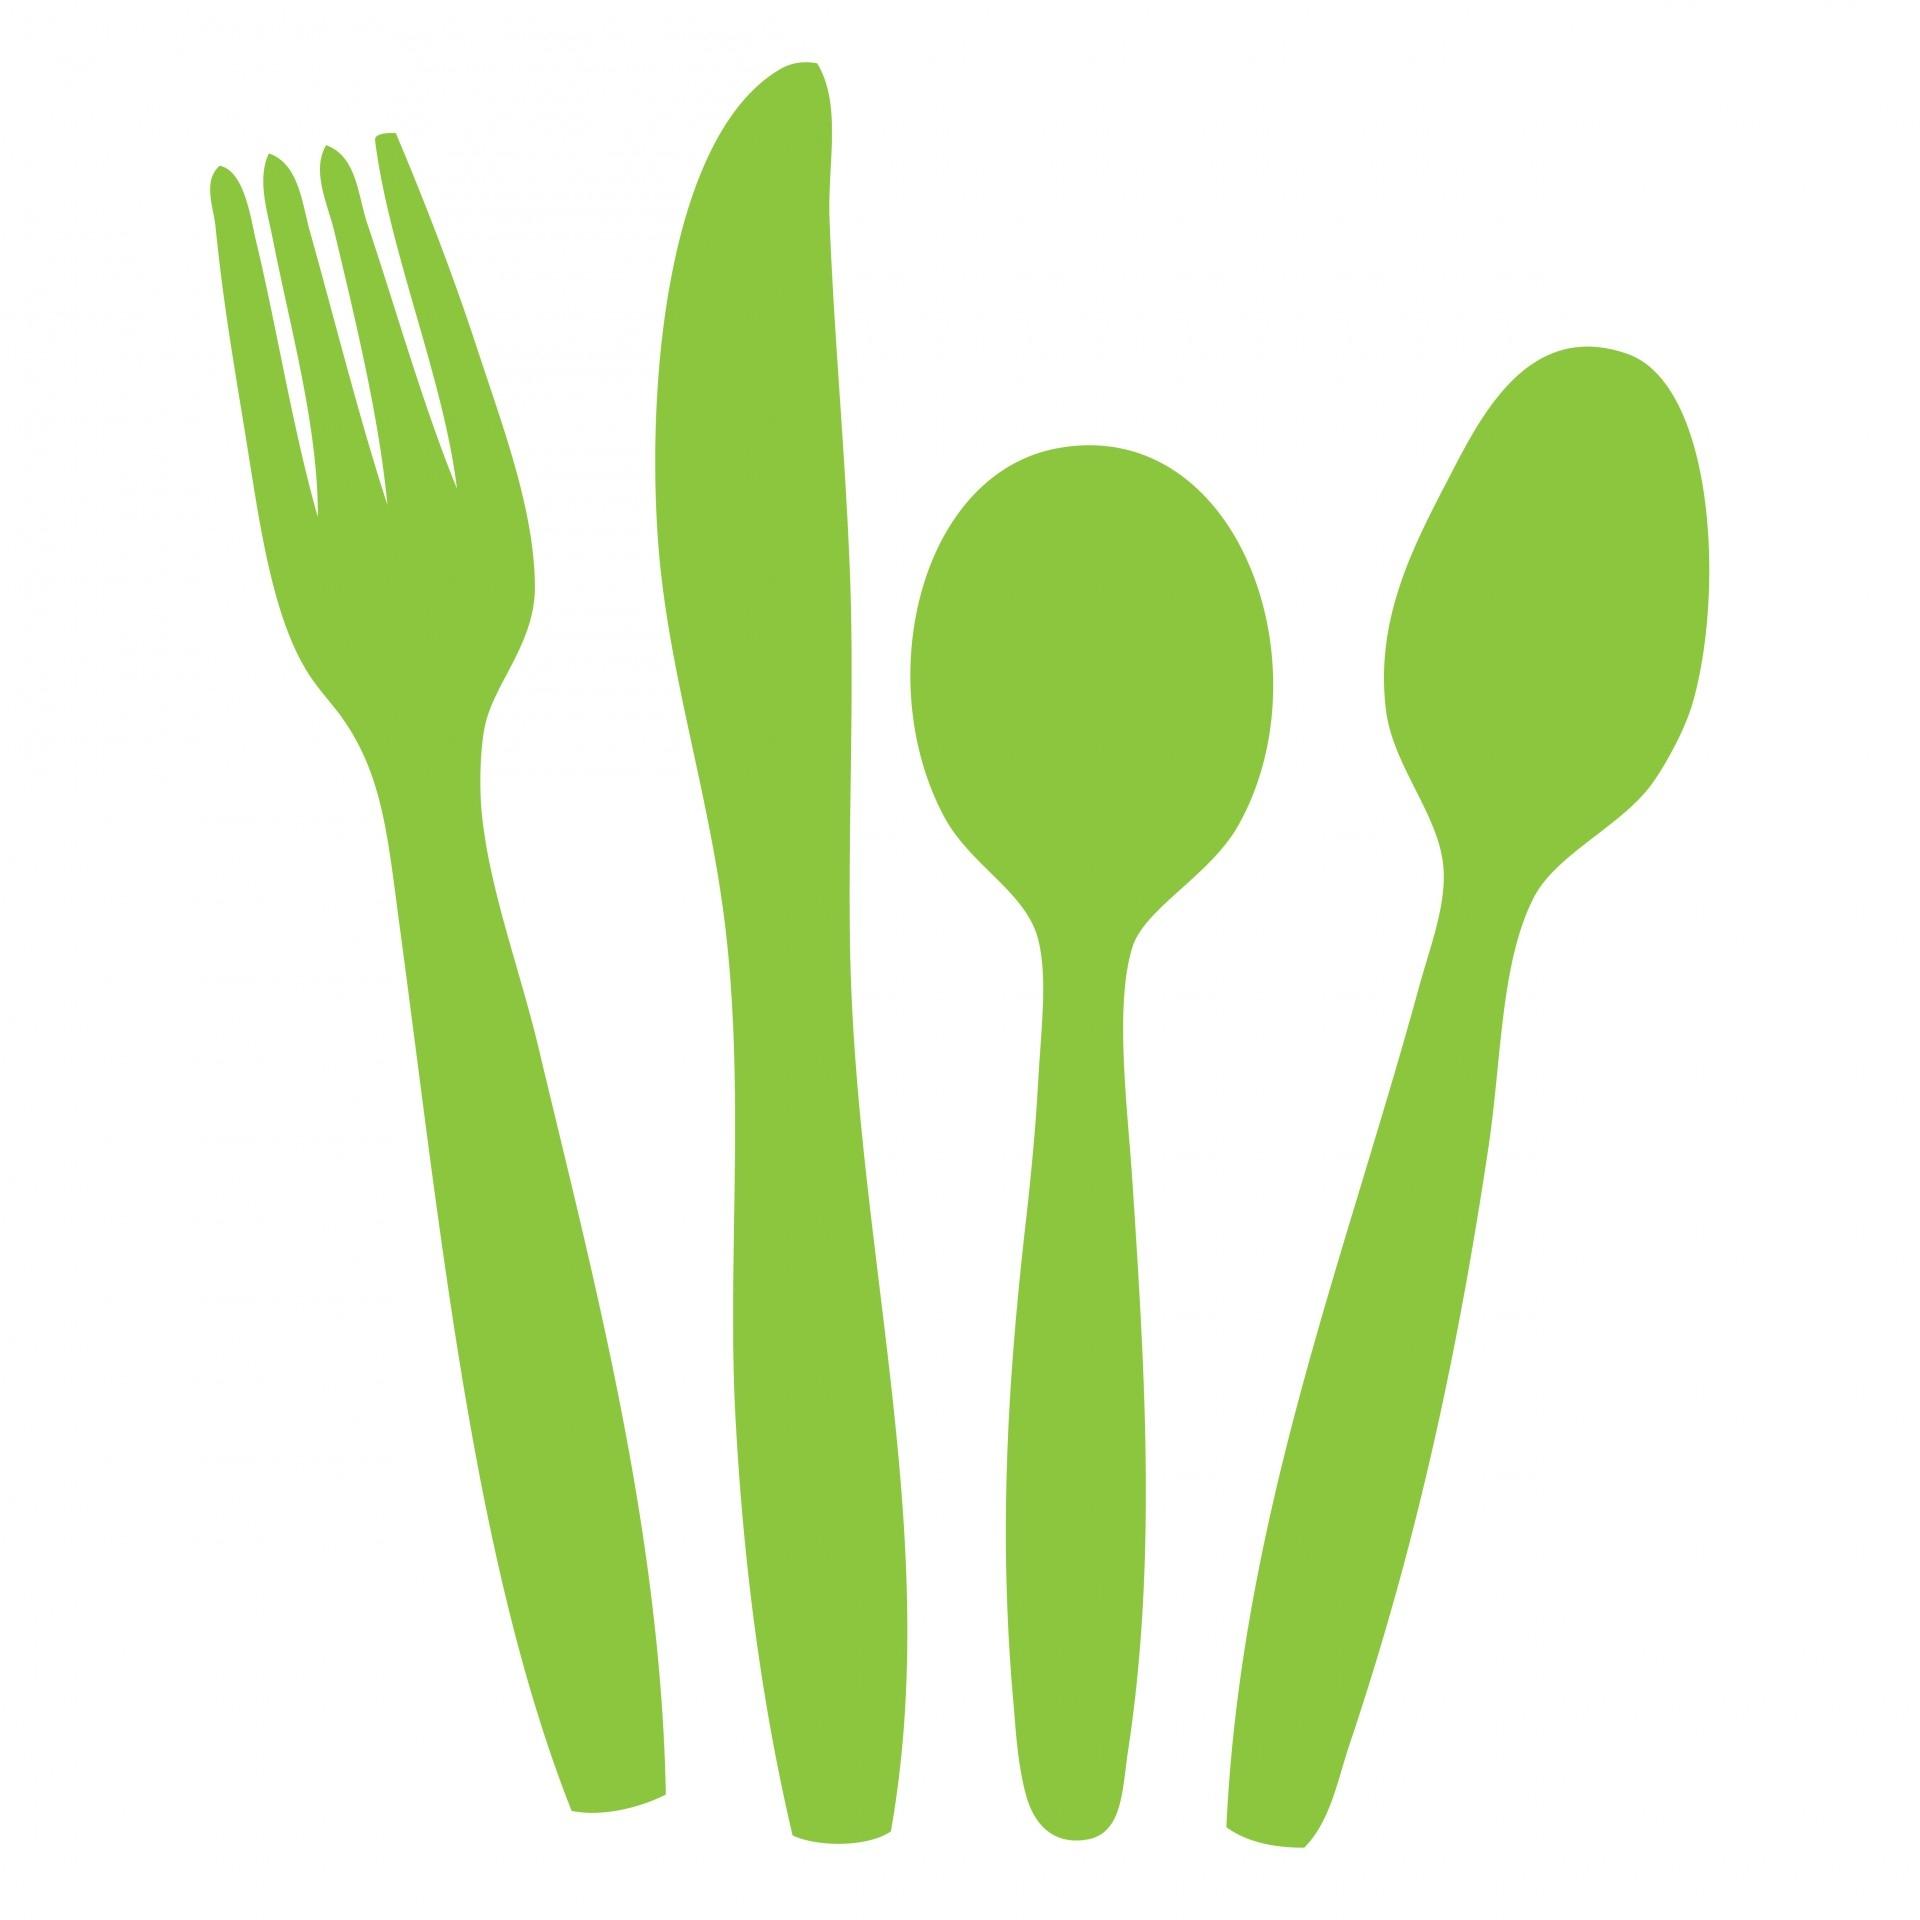 Silverware free cutlery clip art